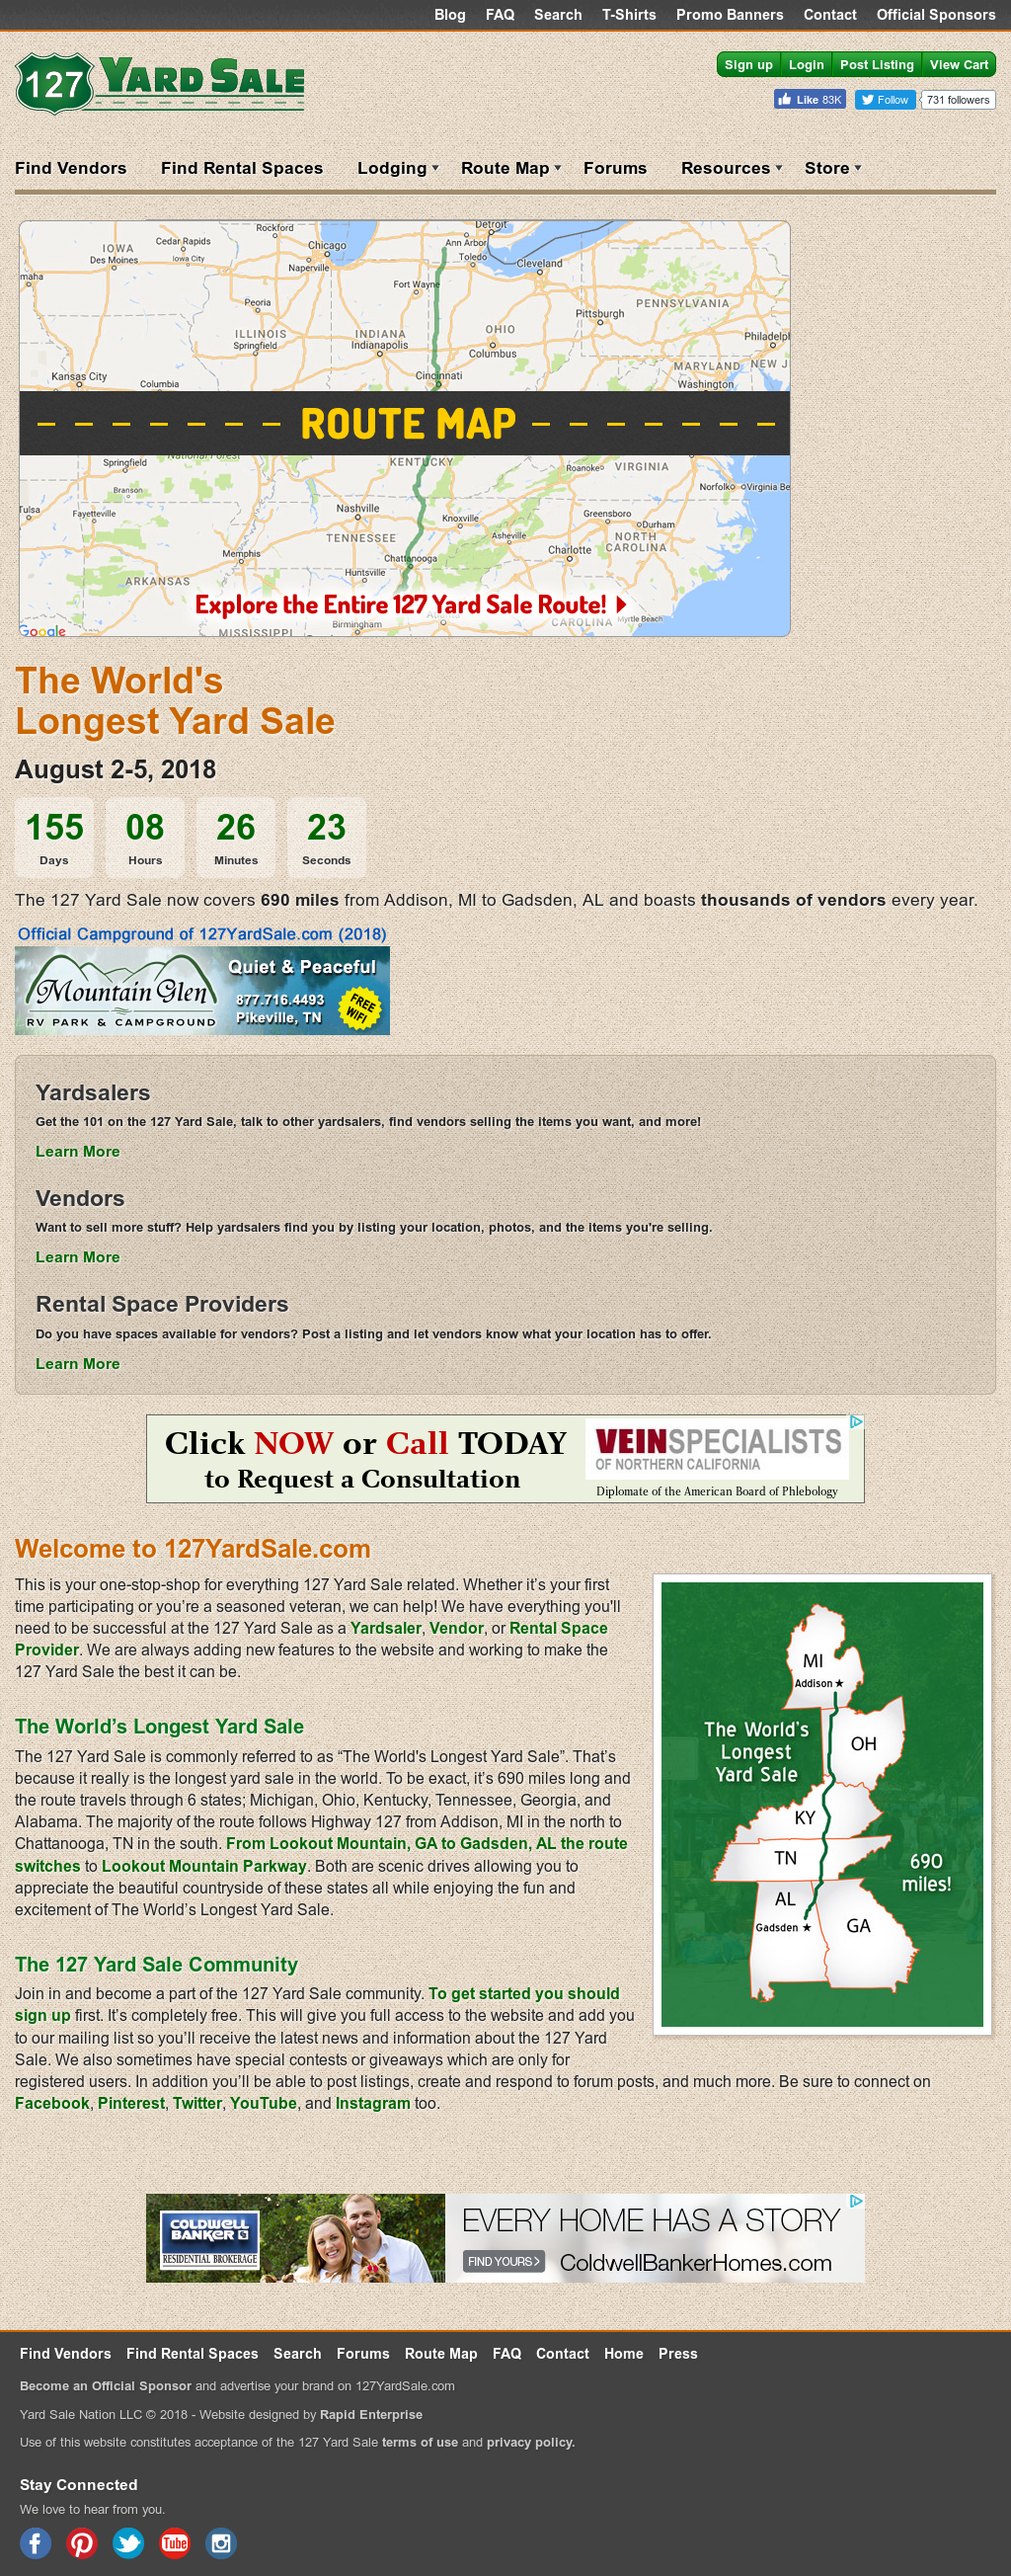 127 Yard Sale - The World's Longest Yard Sale Competitors